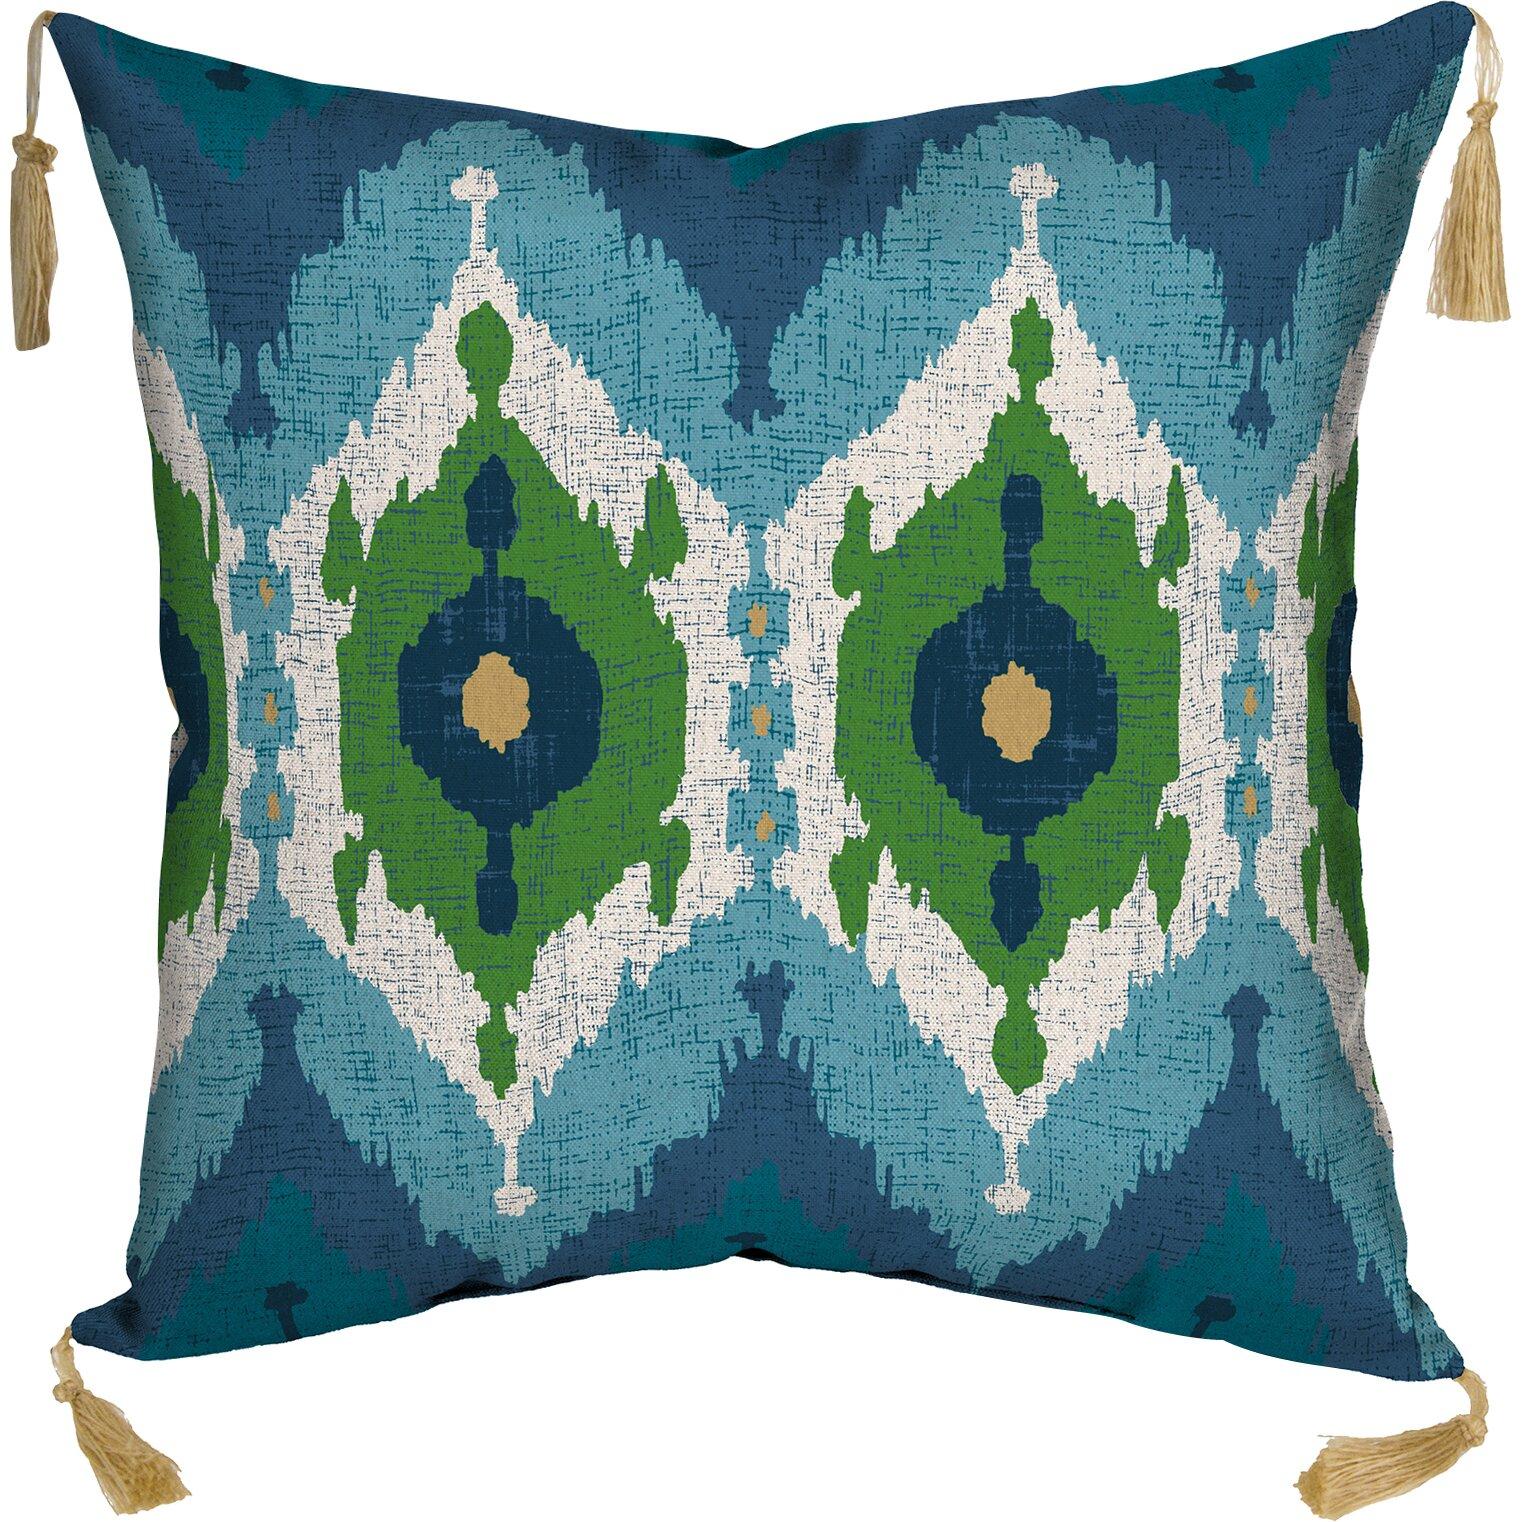 Zanzibar Throw Pillows : BombayOutdoors Royal Zanzibar Ikat Reversible Outdoor Throw Pillow & Reviews Wayfair